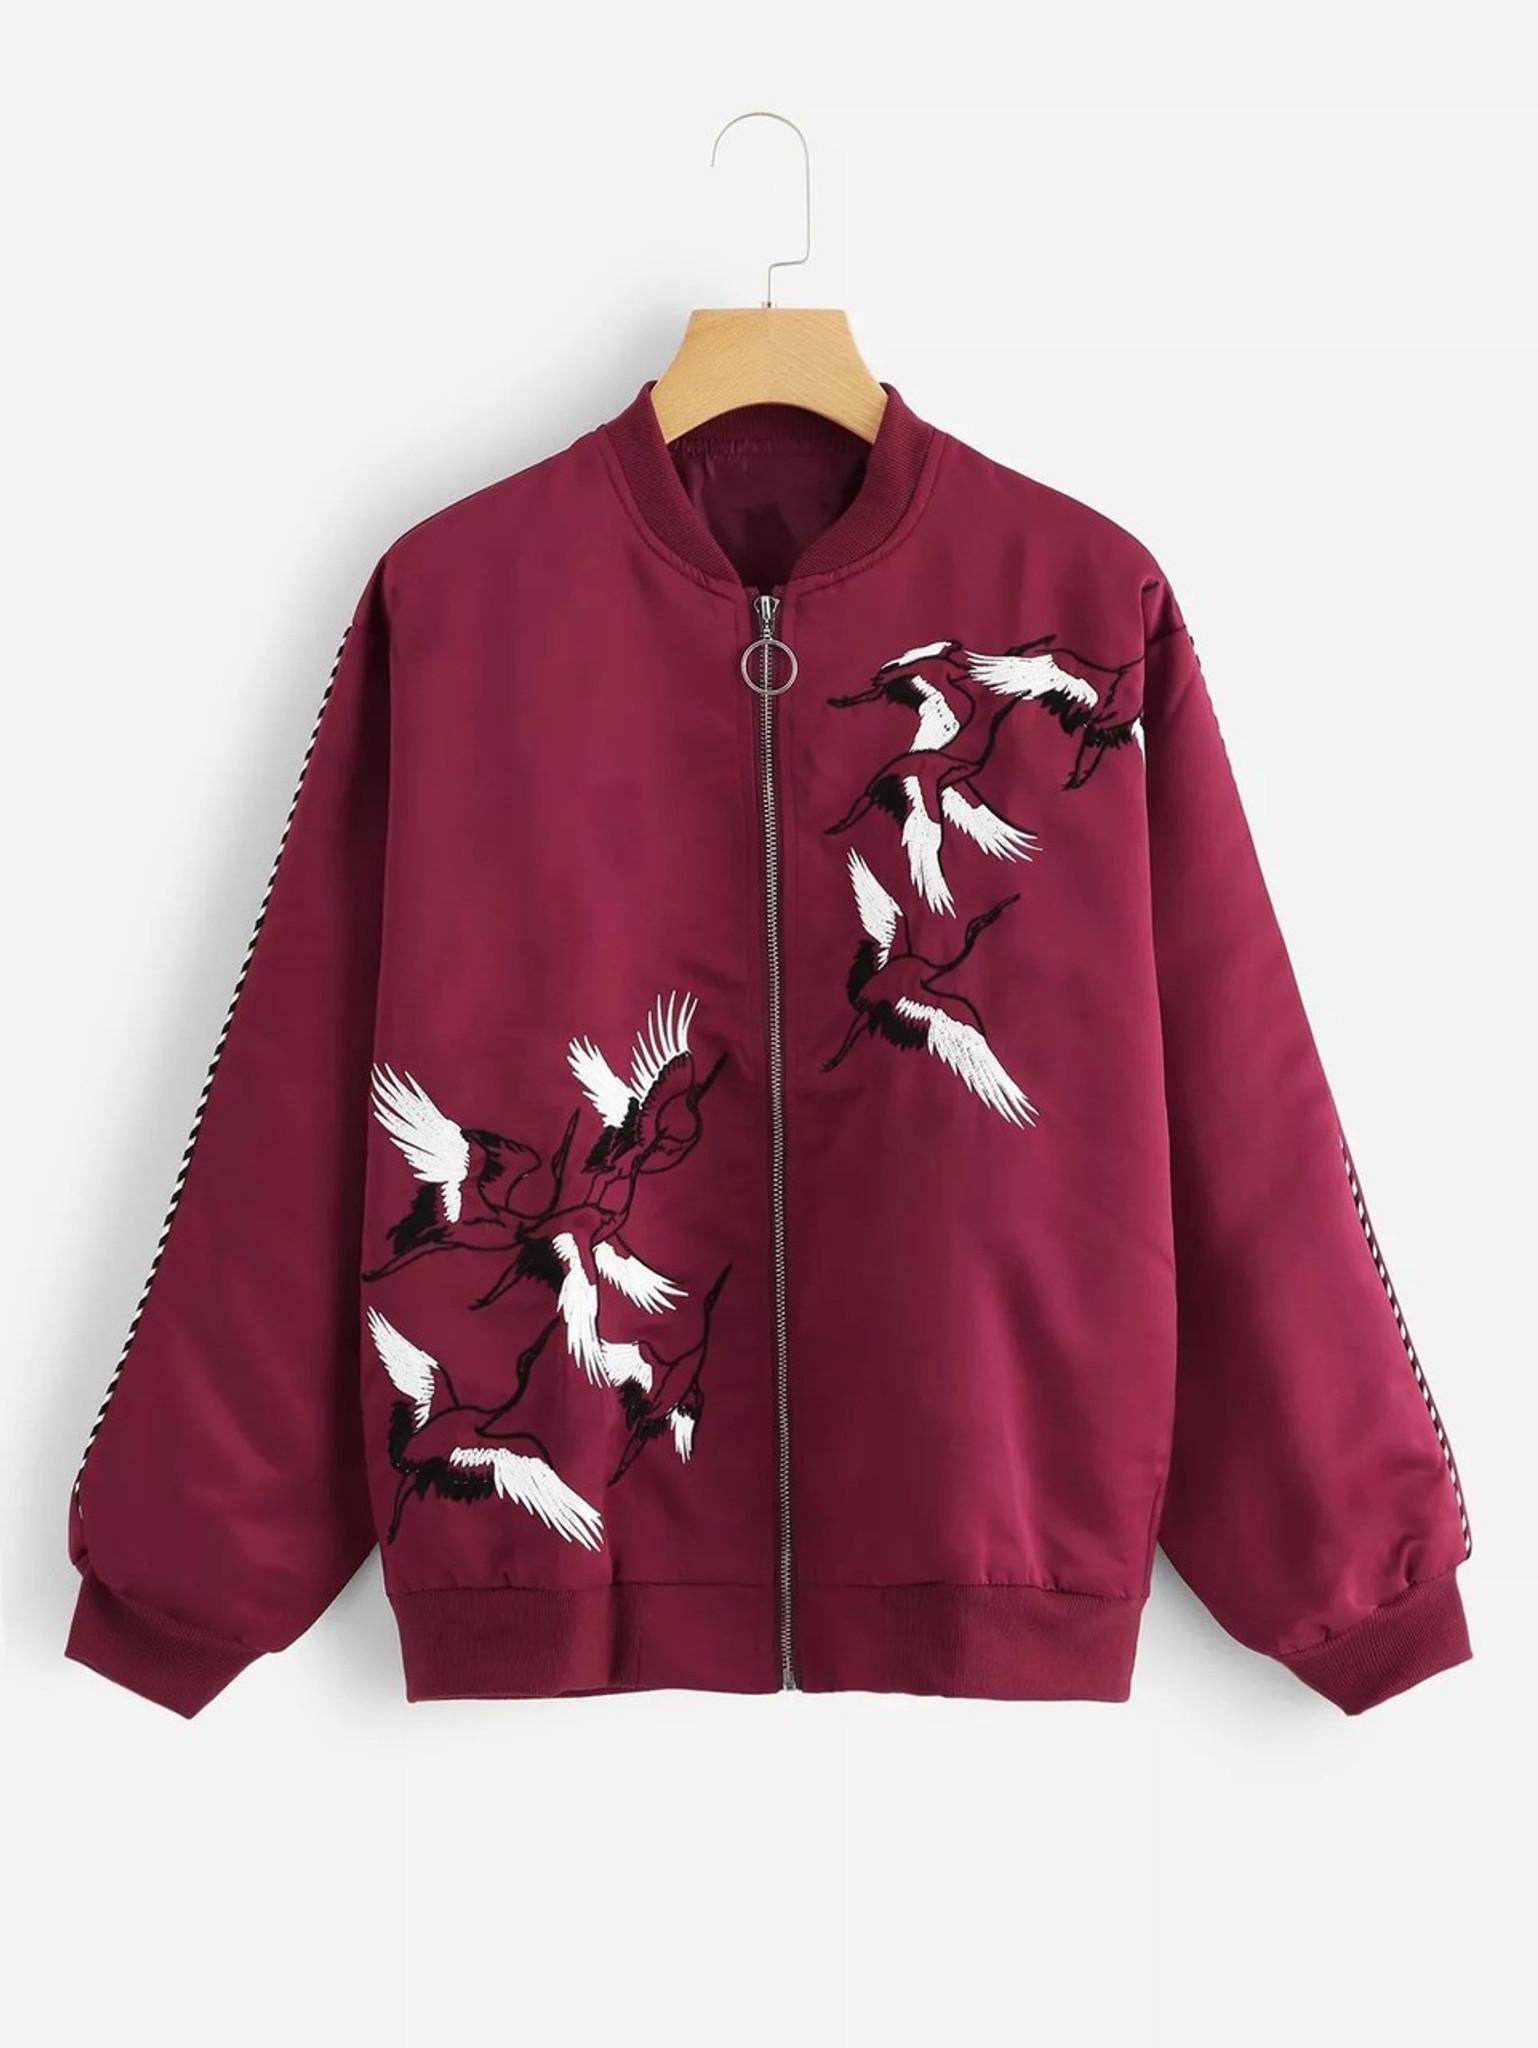 5952c1fe3 Fifth Avenue Women's Crane Print Fleece Bomber Jacket LNA1002 - Maroon